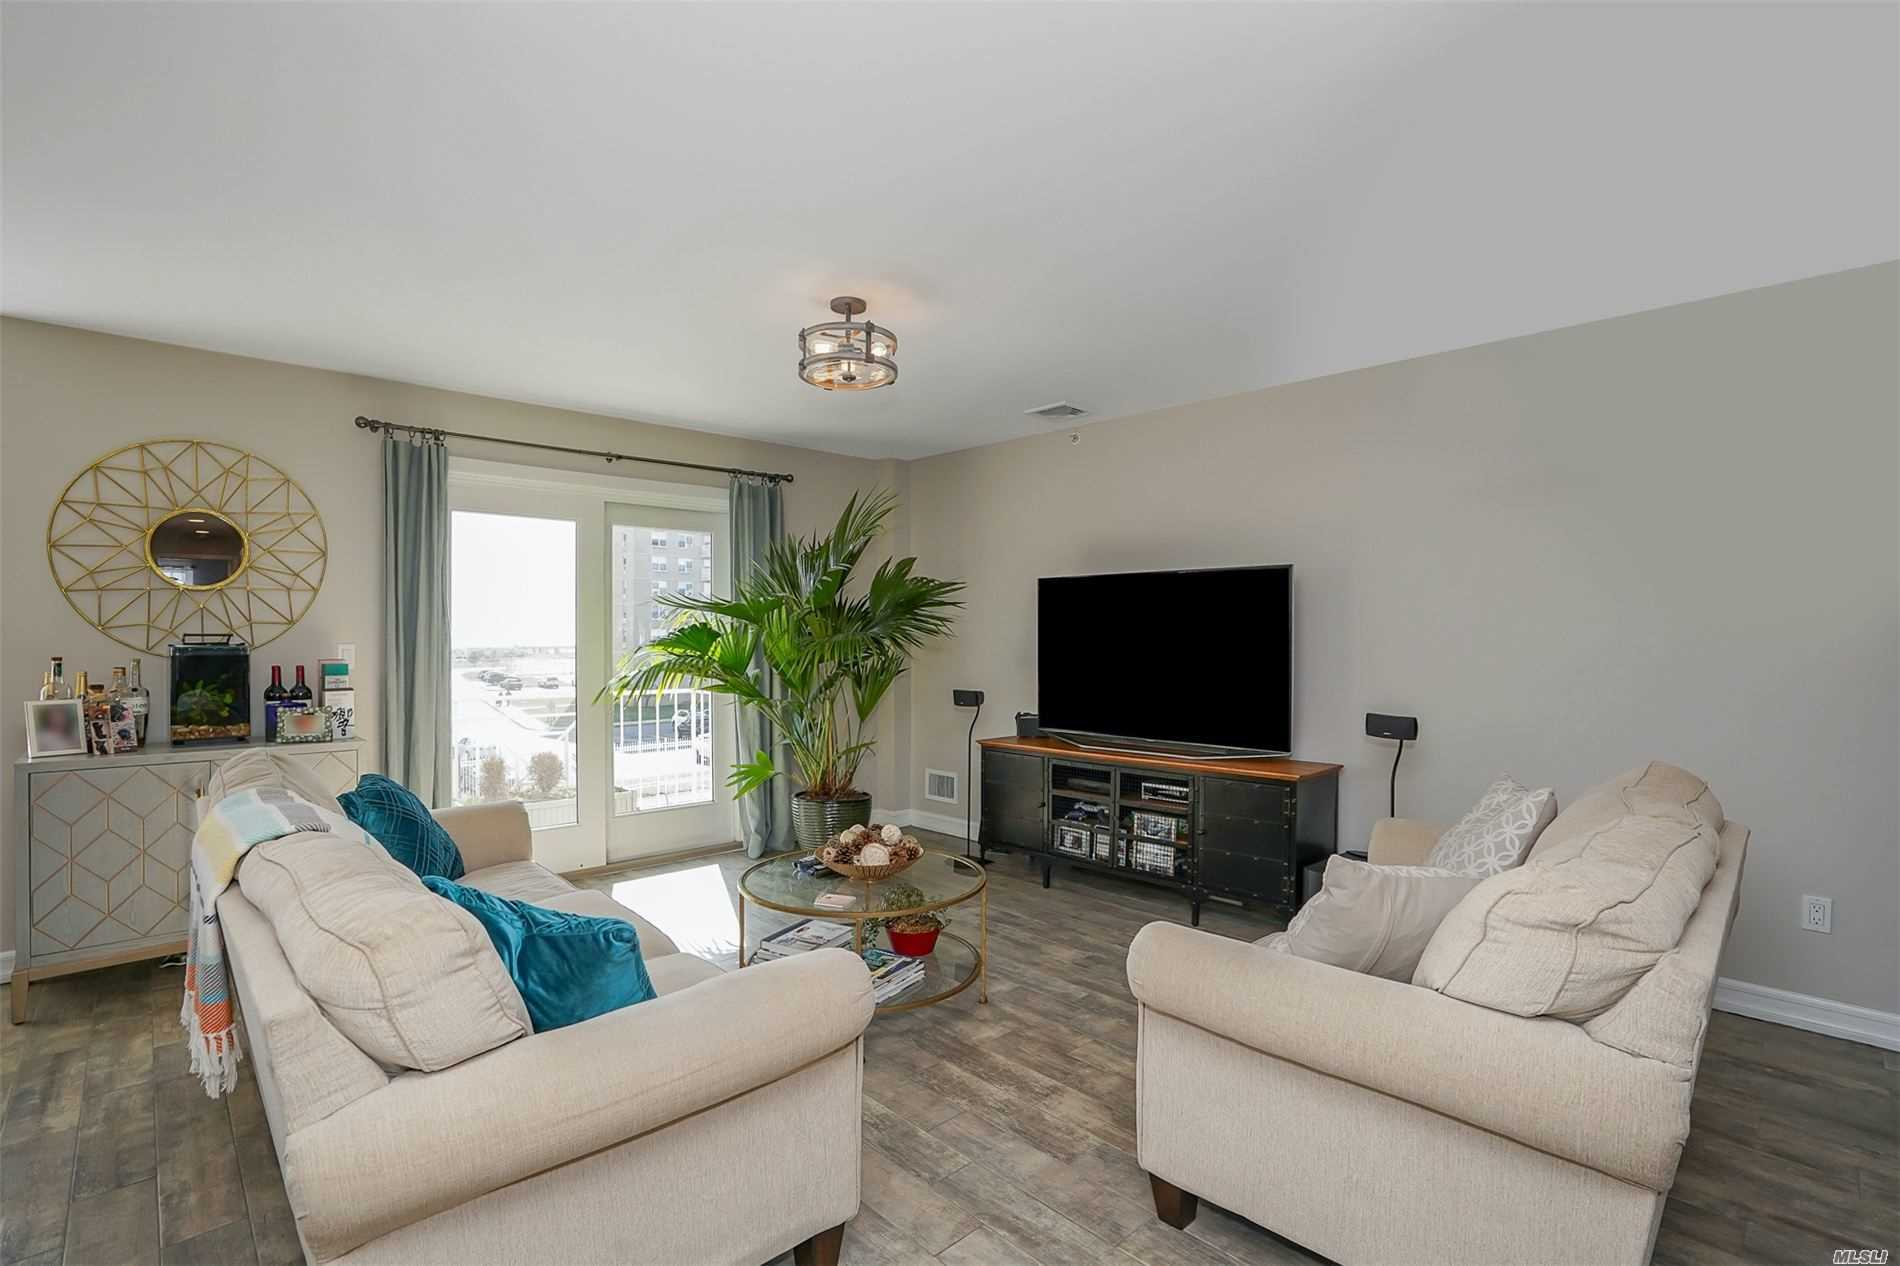 Property for sale at 102-10 Rockaway Beach Boulevard # 3, Rockaway Park NY 11694, Rockaway Park,  New York 11694